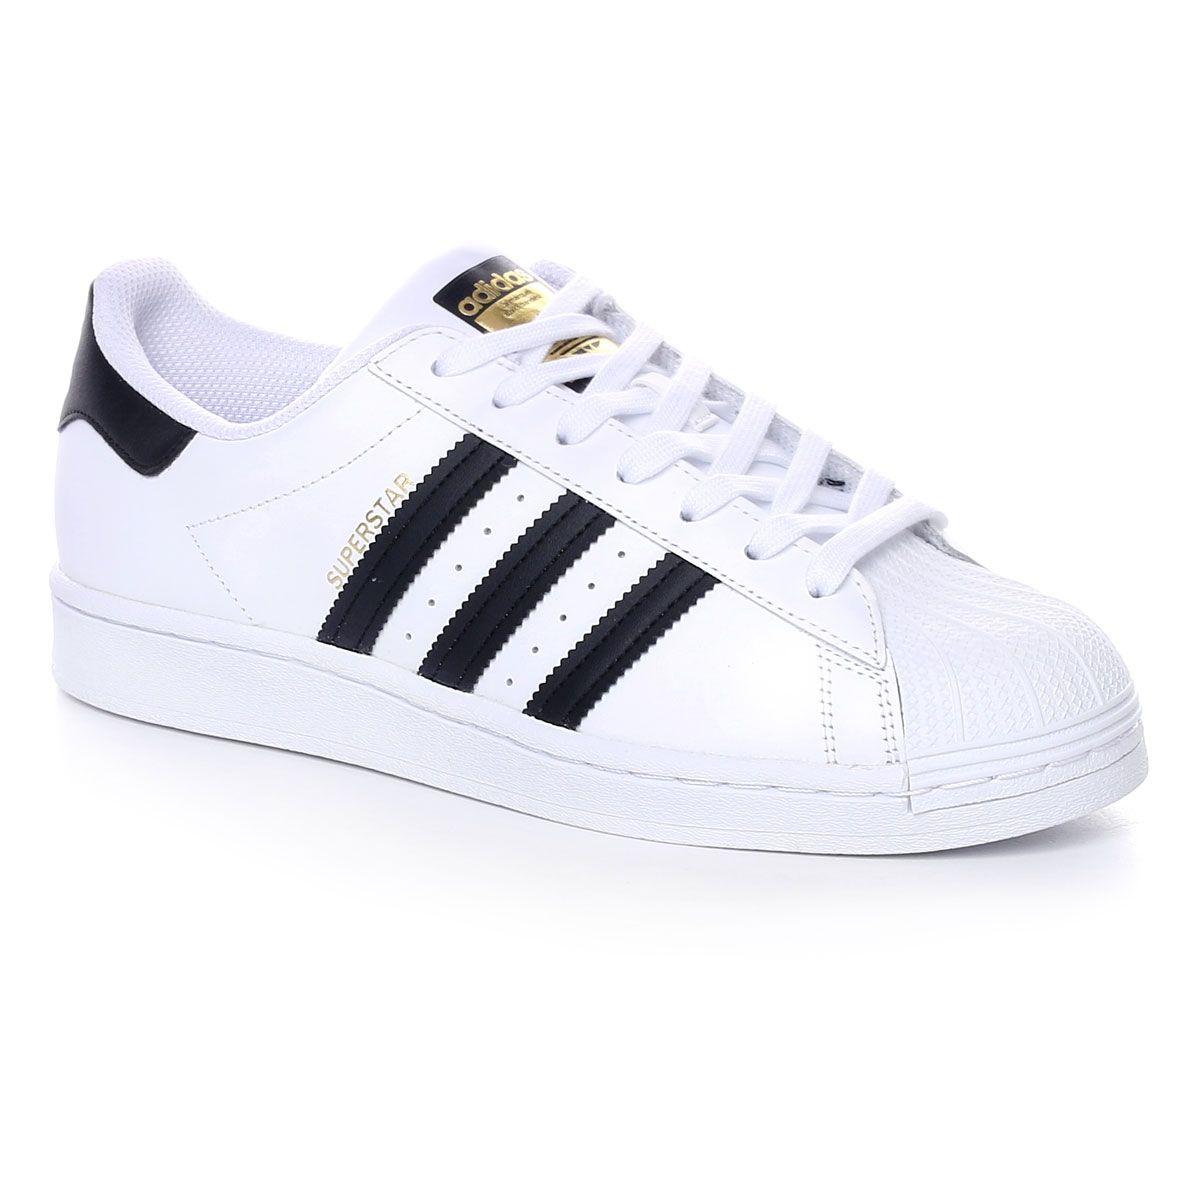 Adidas Originals Superstar Bianco Nero